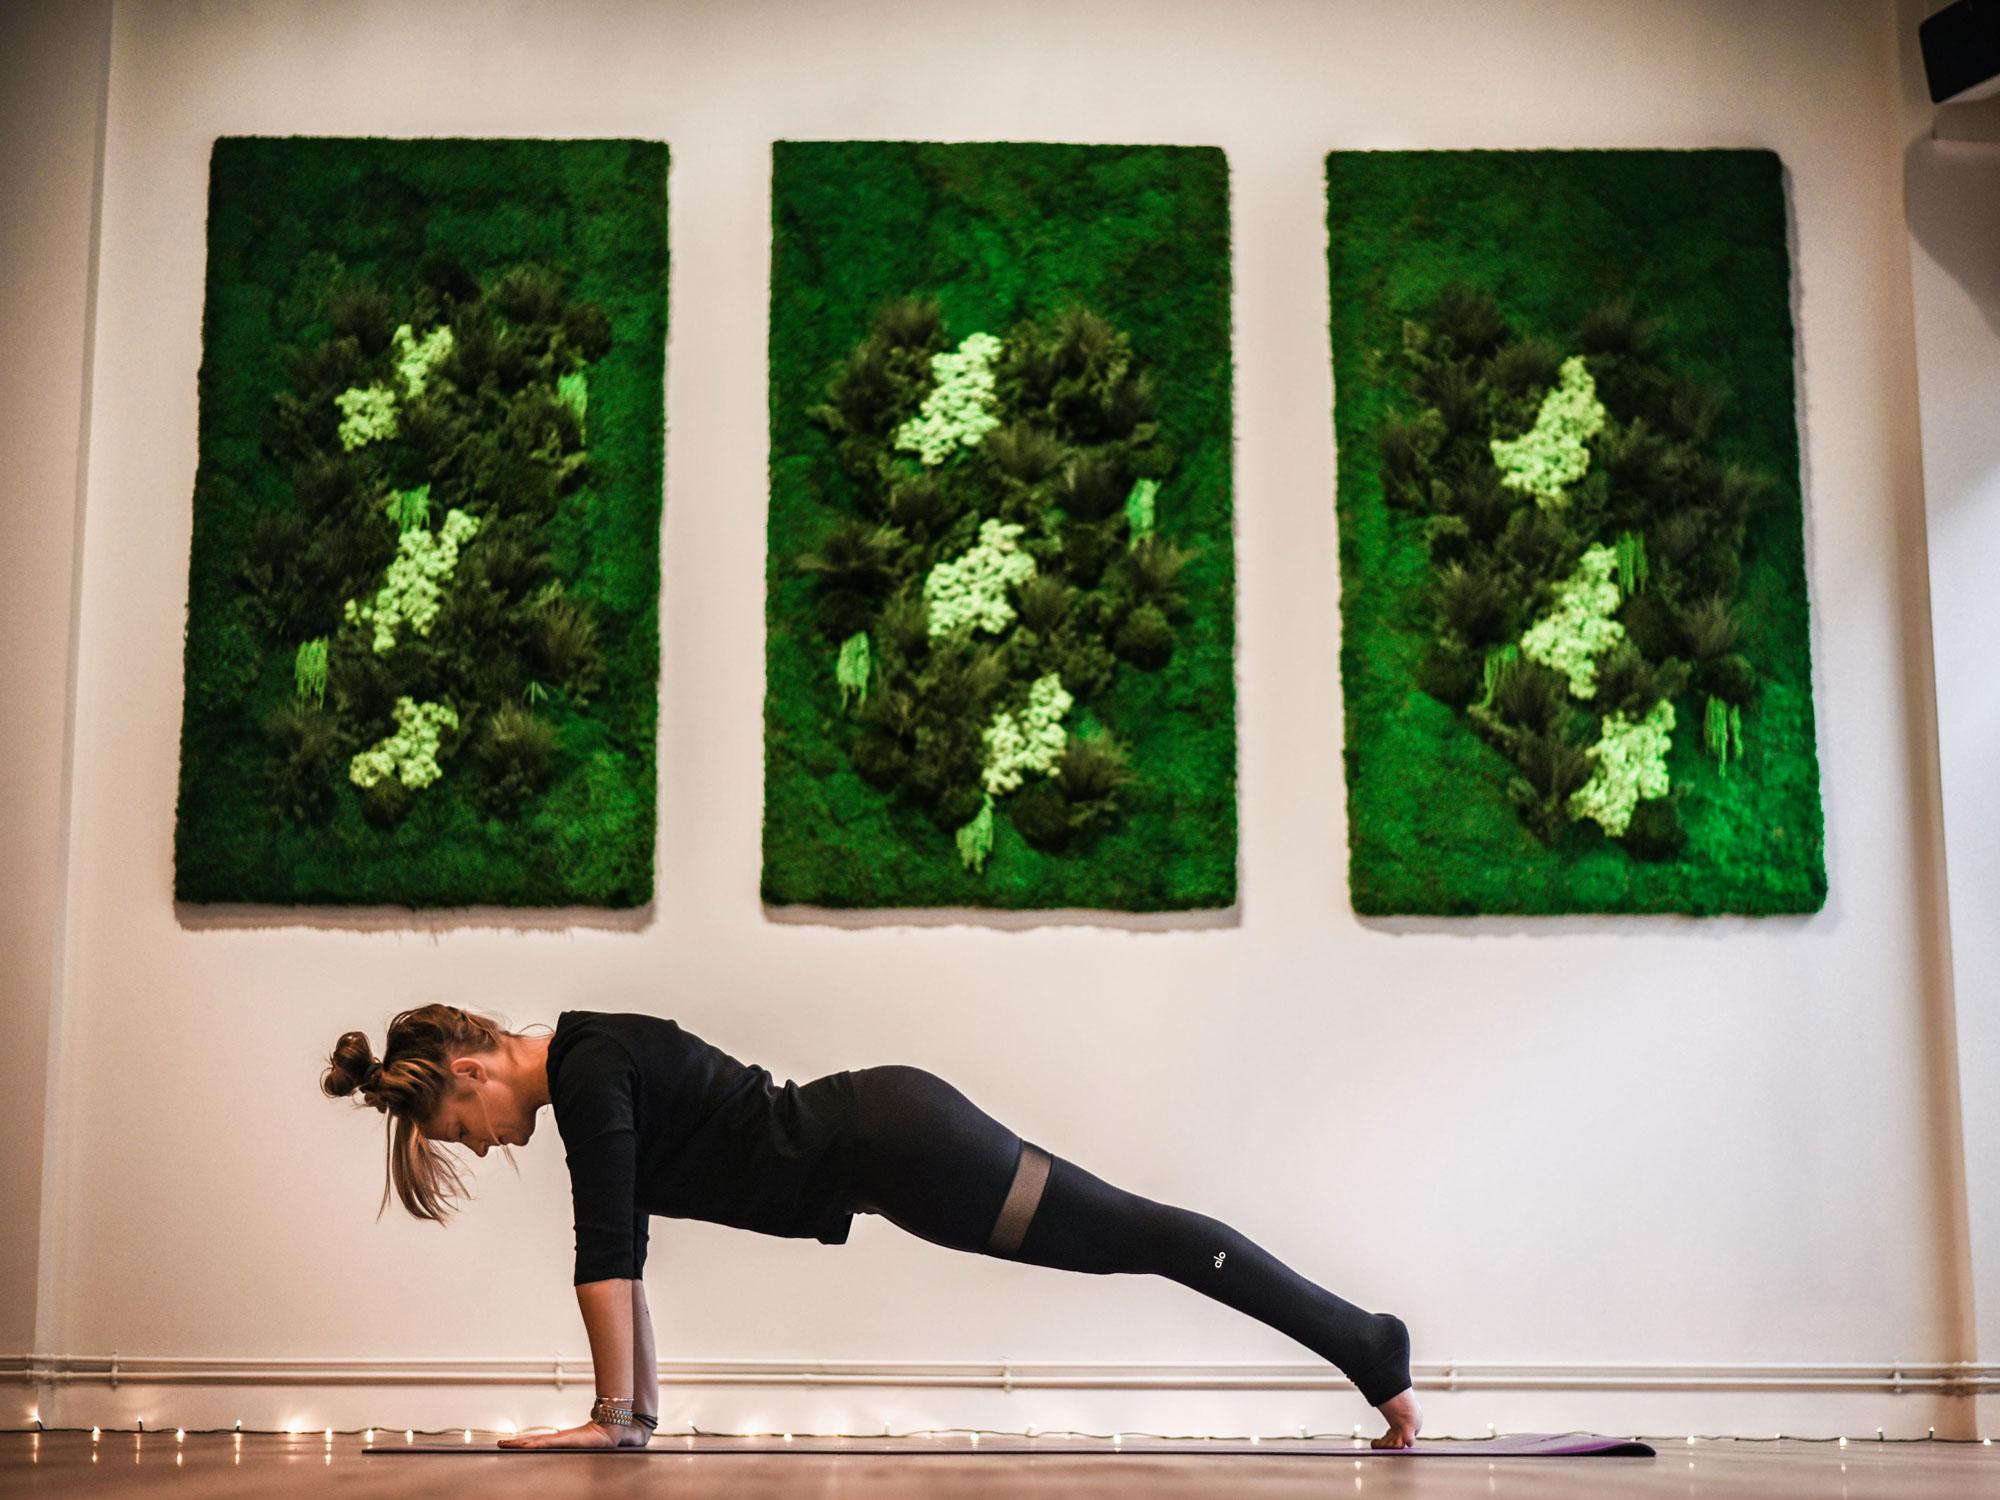 Atelier Yoga pilates studio Rouen